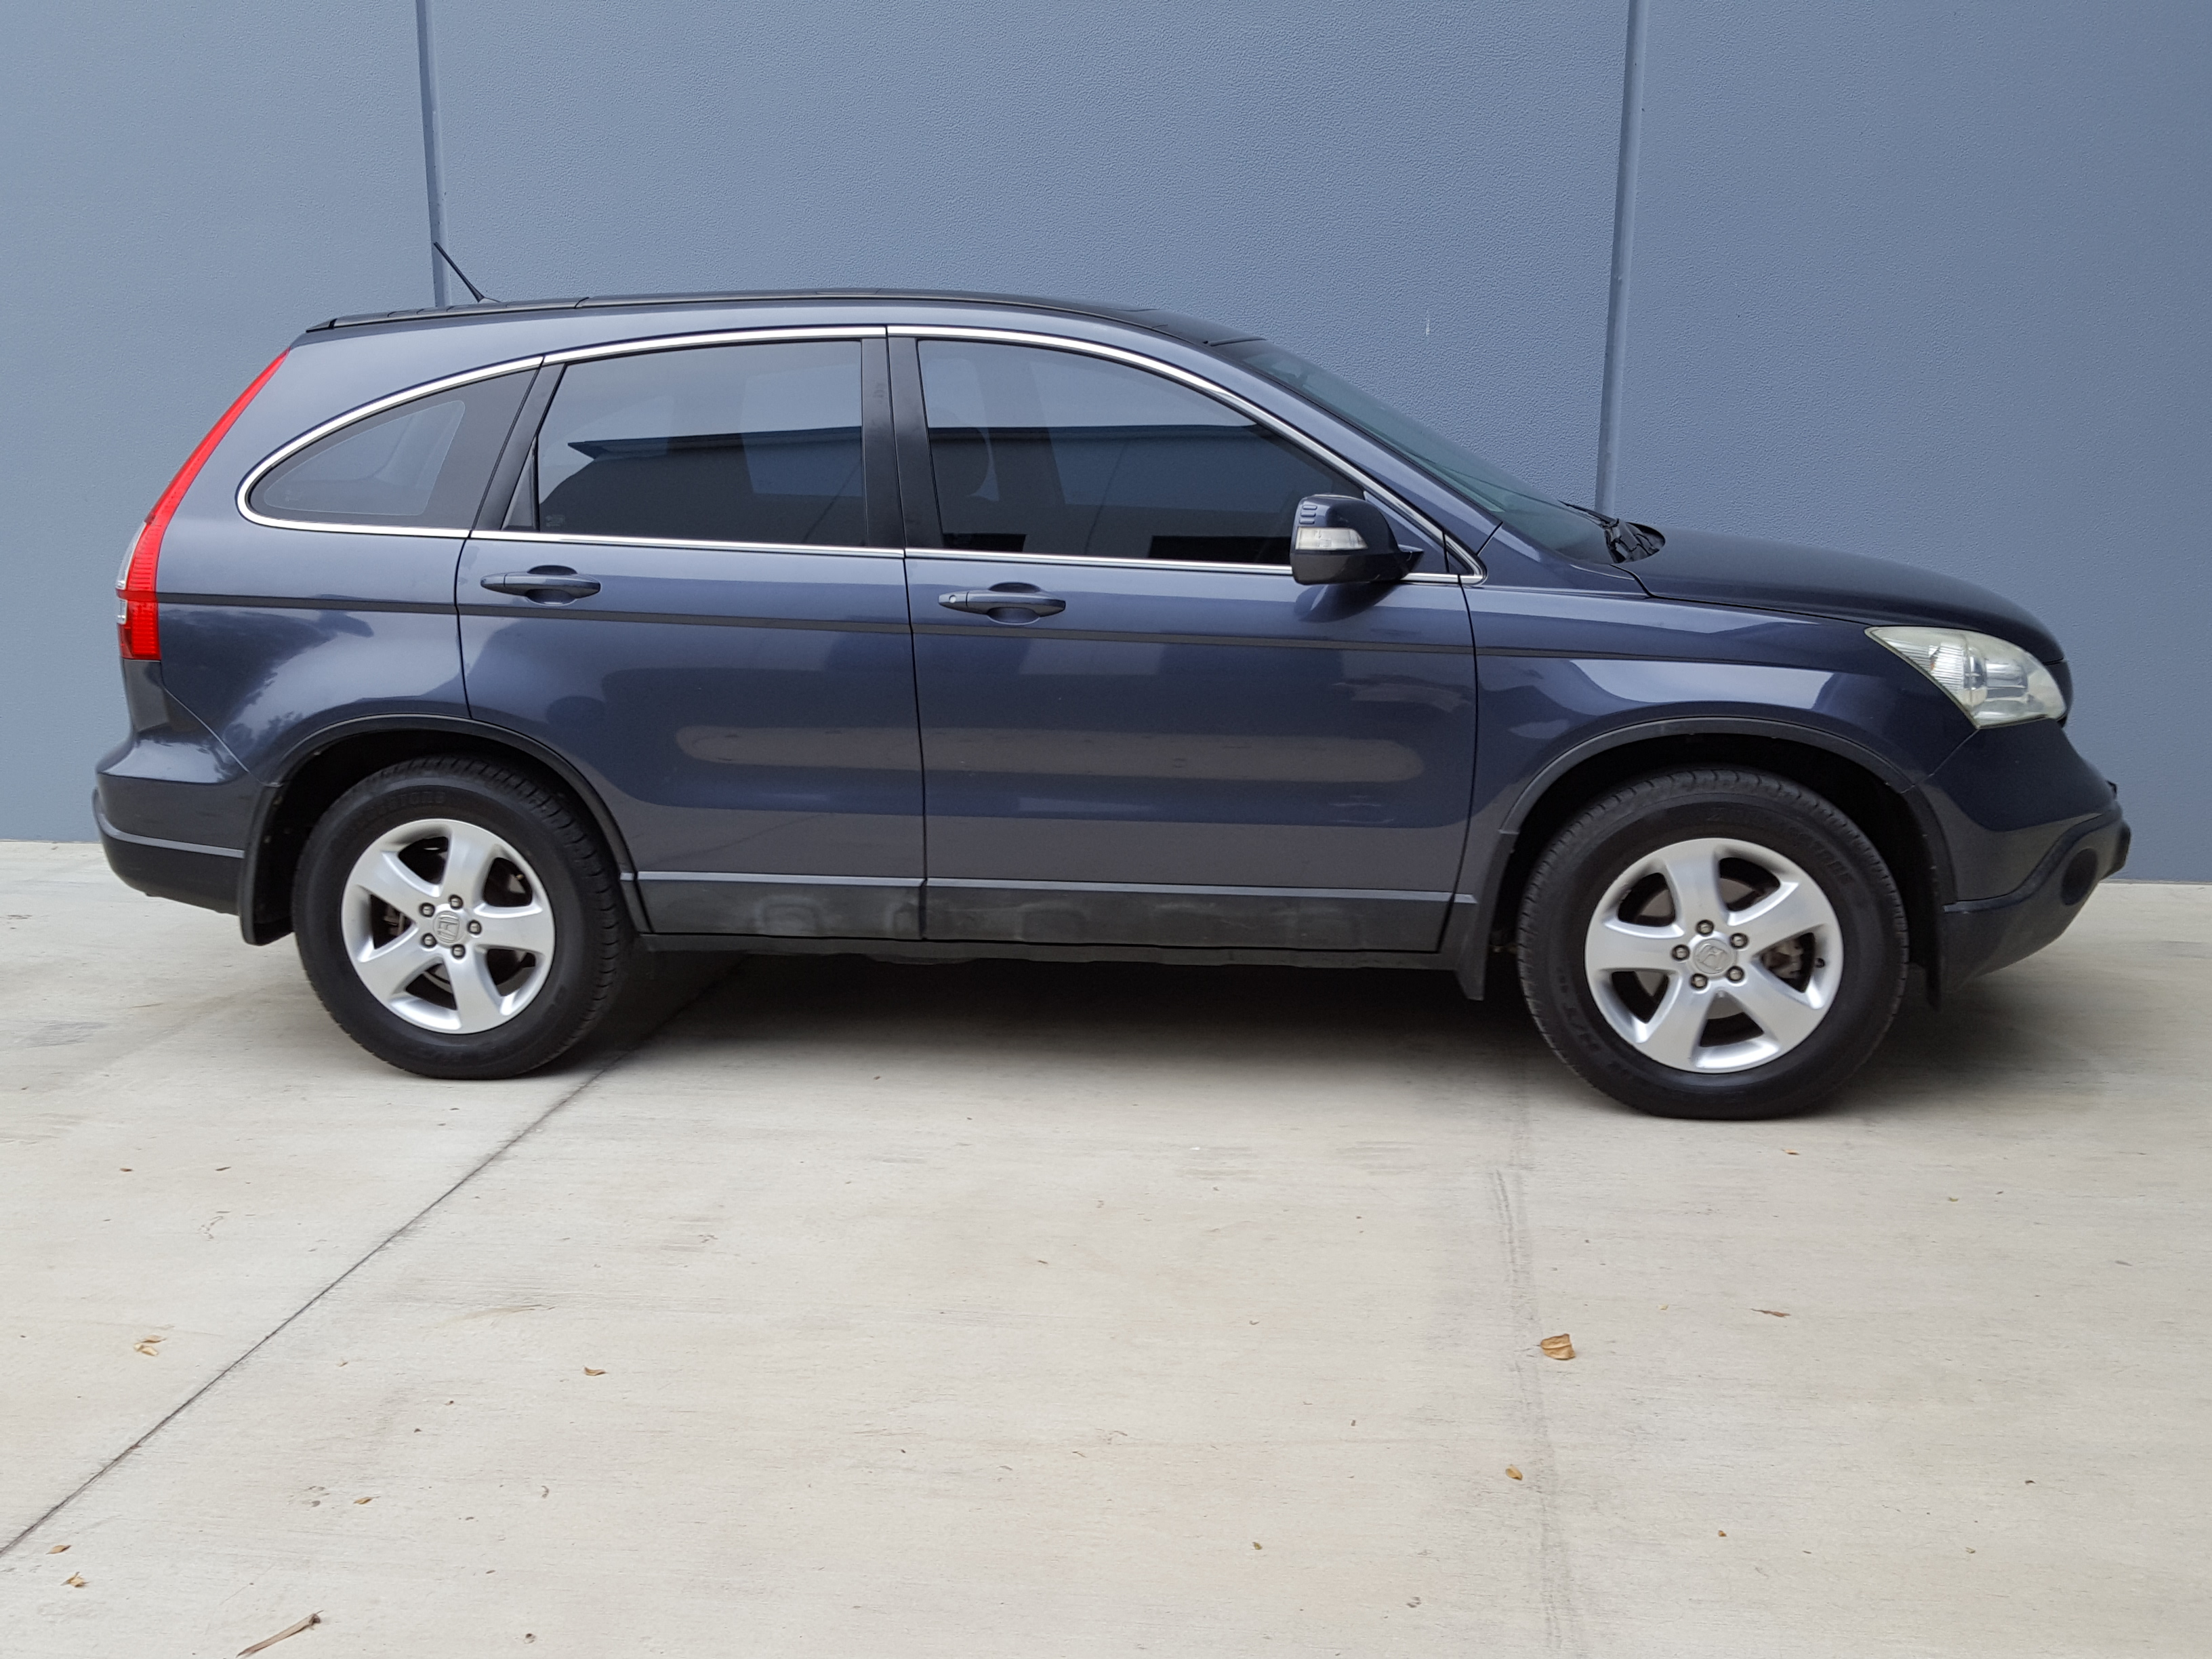 (SOLD) 2007 Automatic Honda CRV 4x4 SUV Sport Wagon top of ...